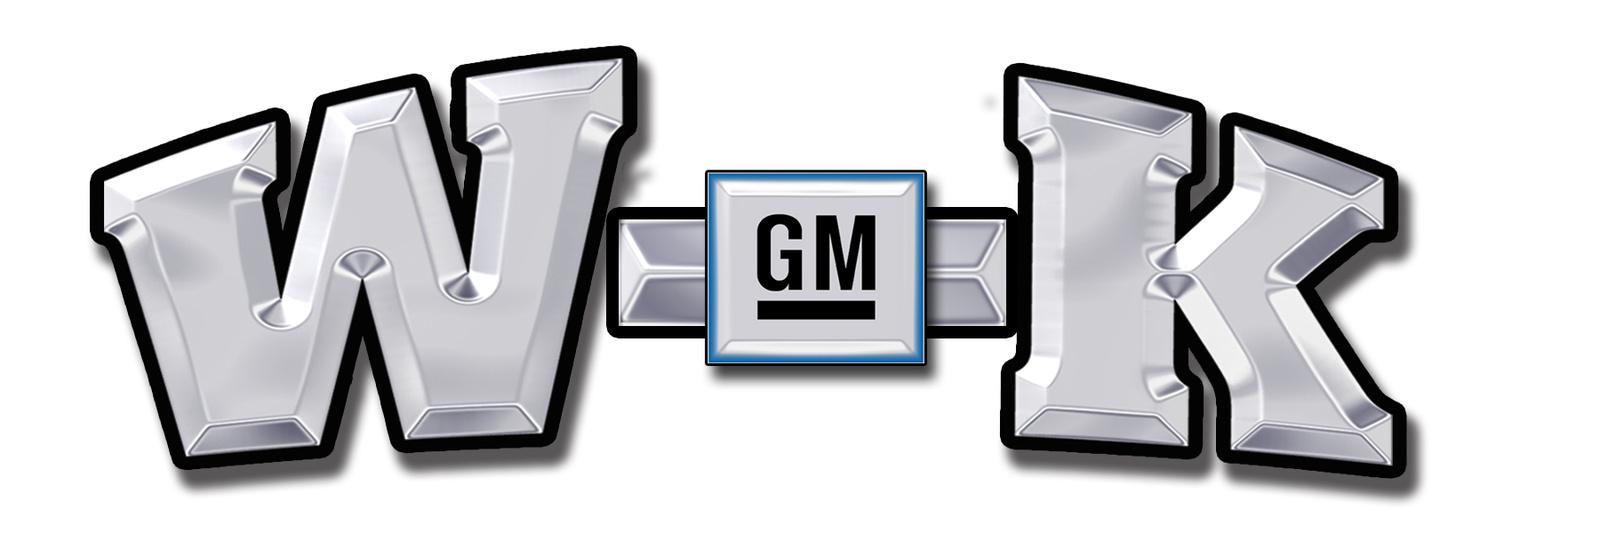 W-K Chevrolet Buick GMC Cadillac - Sedalia, MO: Read Consumer ...